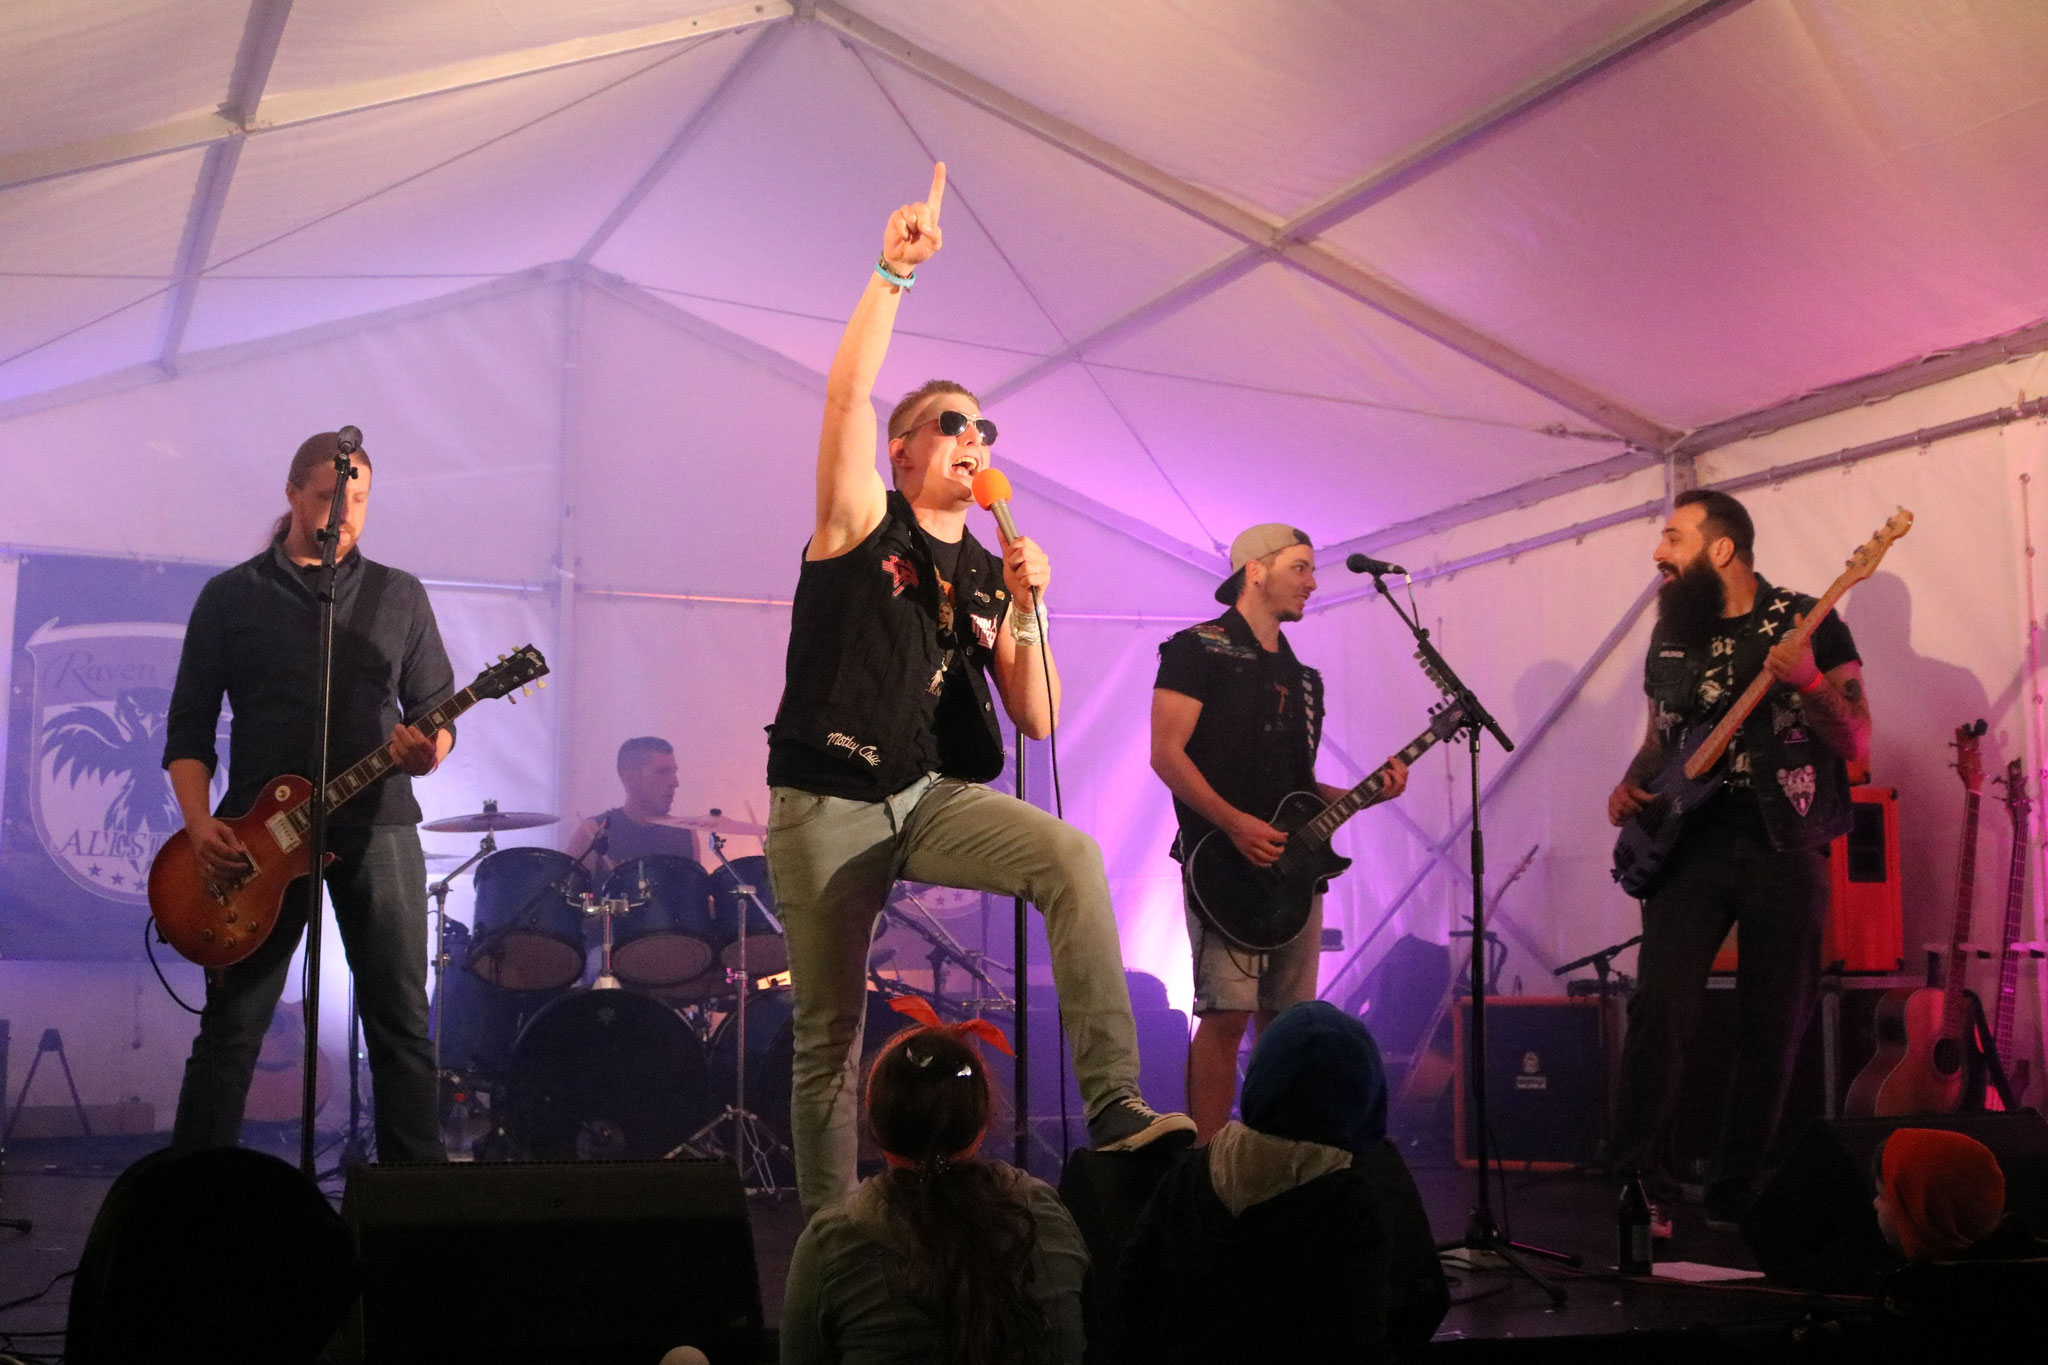 Raven Rock Allstars - Suuuper!